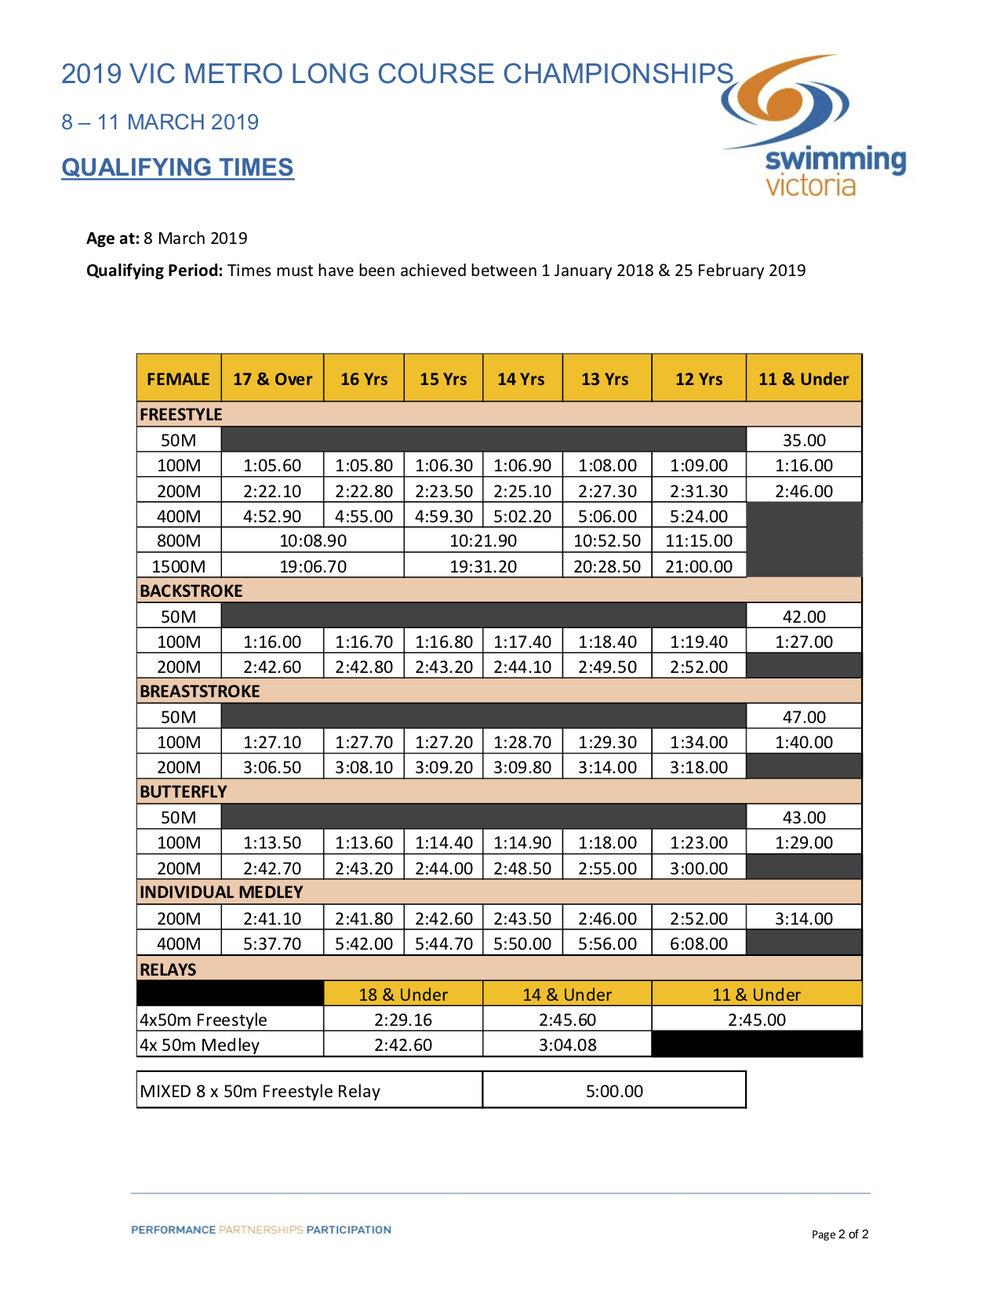 2019 Vic Metro LC Championships Qualifying Times pg2.jpg